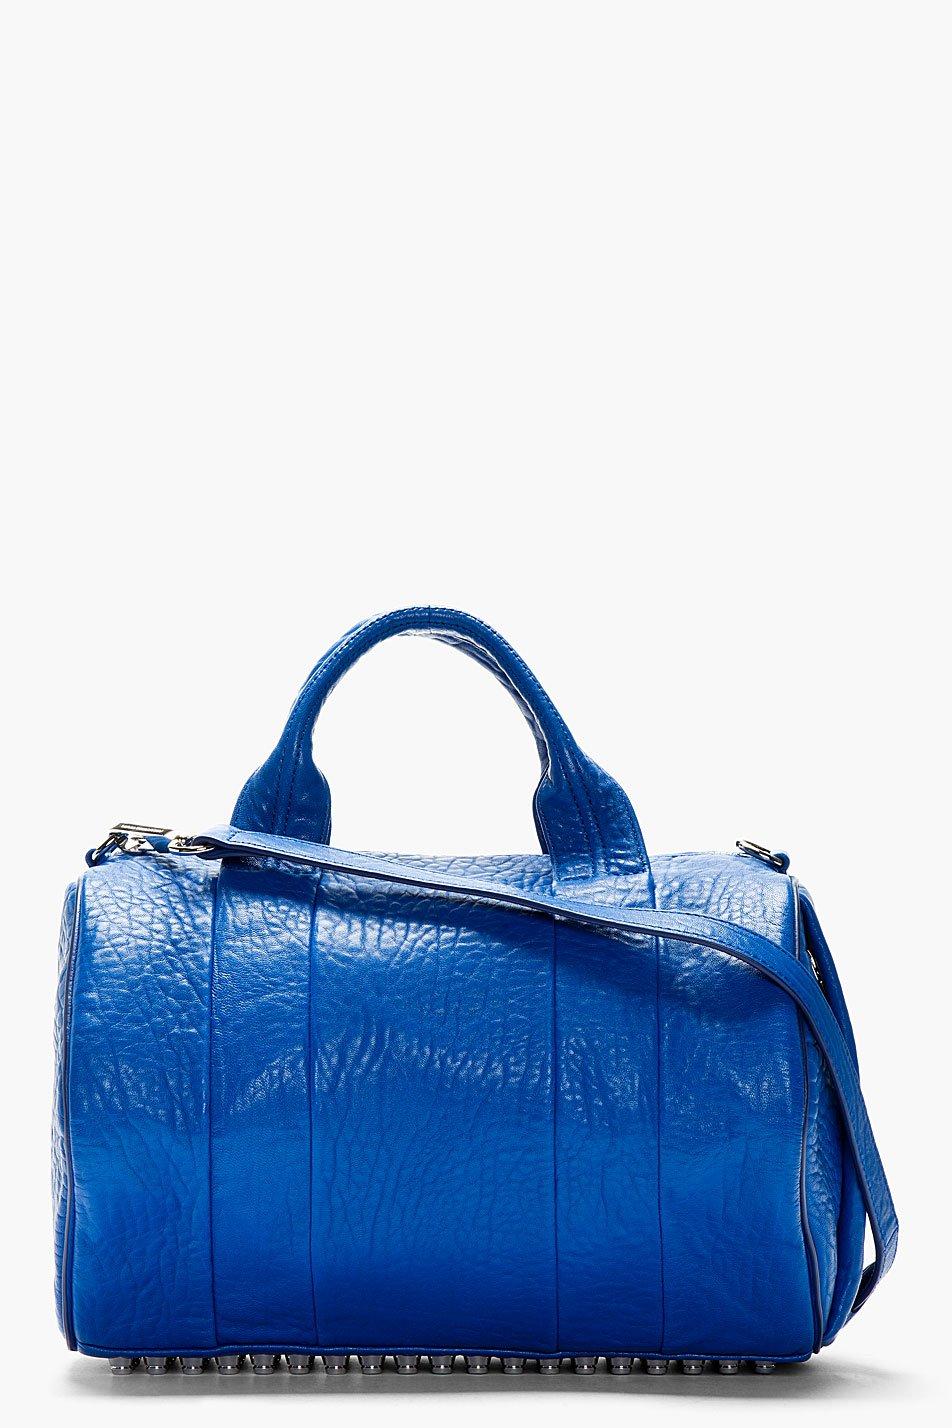 Alexander wang blue grained lambskin rocco duffle bag